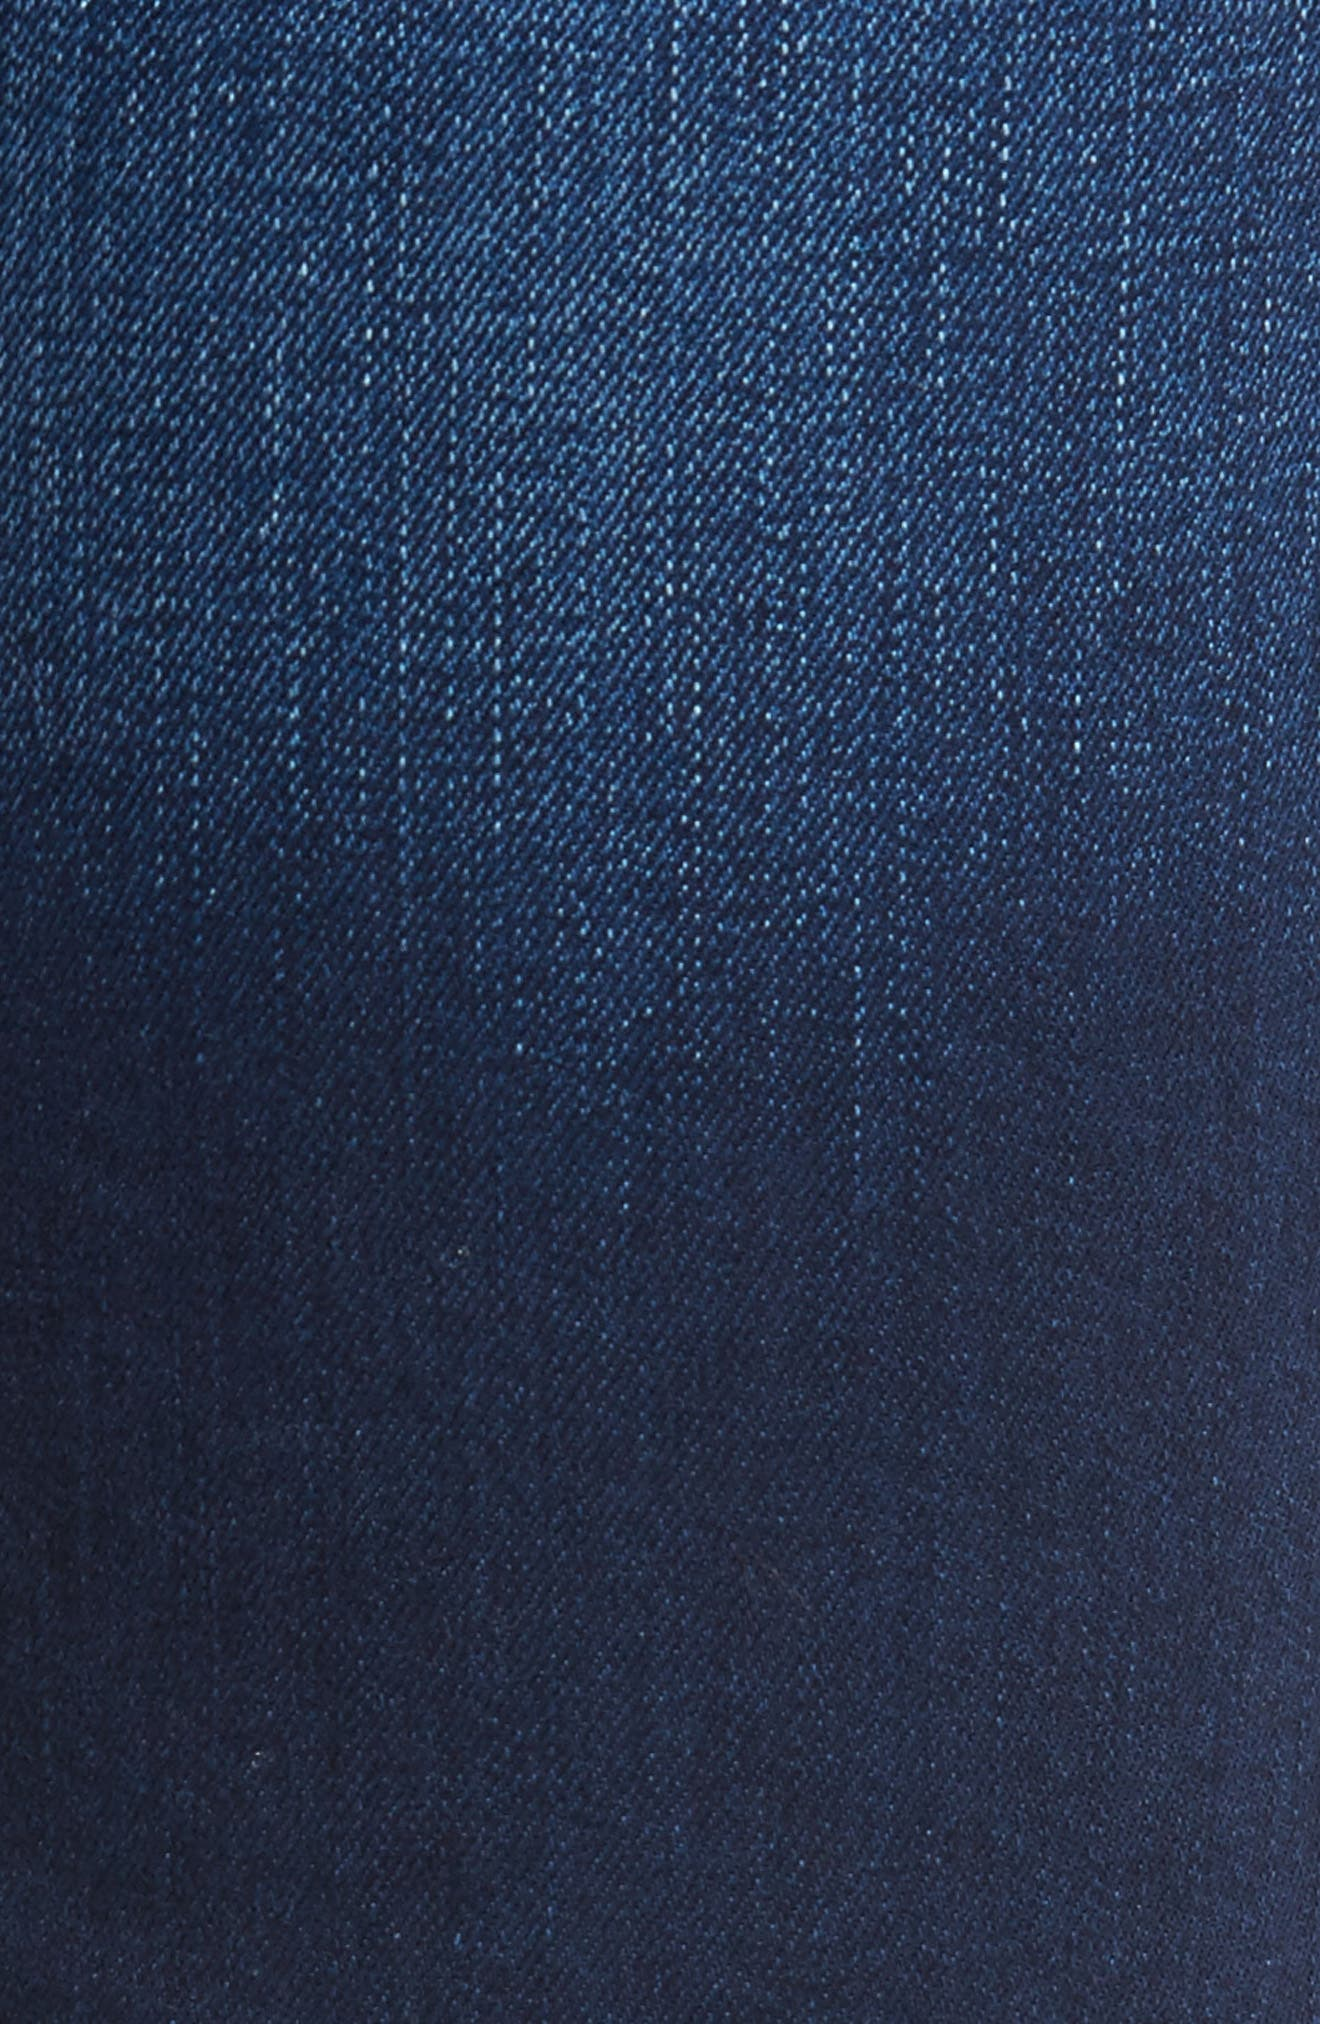 Zatiny Bootcut Jeans,                             Alternate thumbnail 5, color,                             400